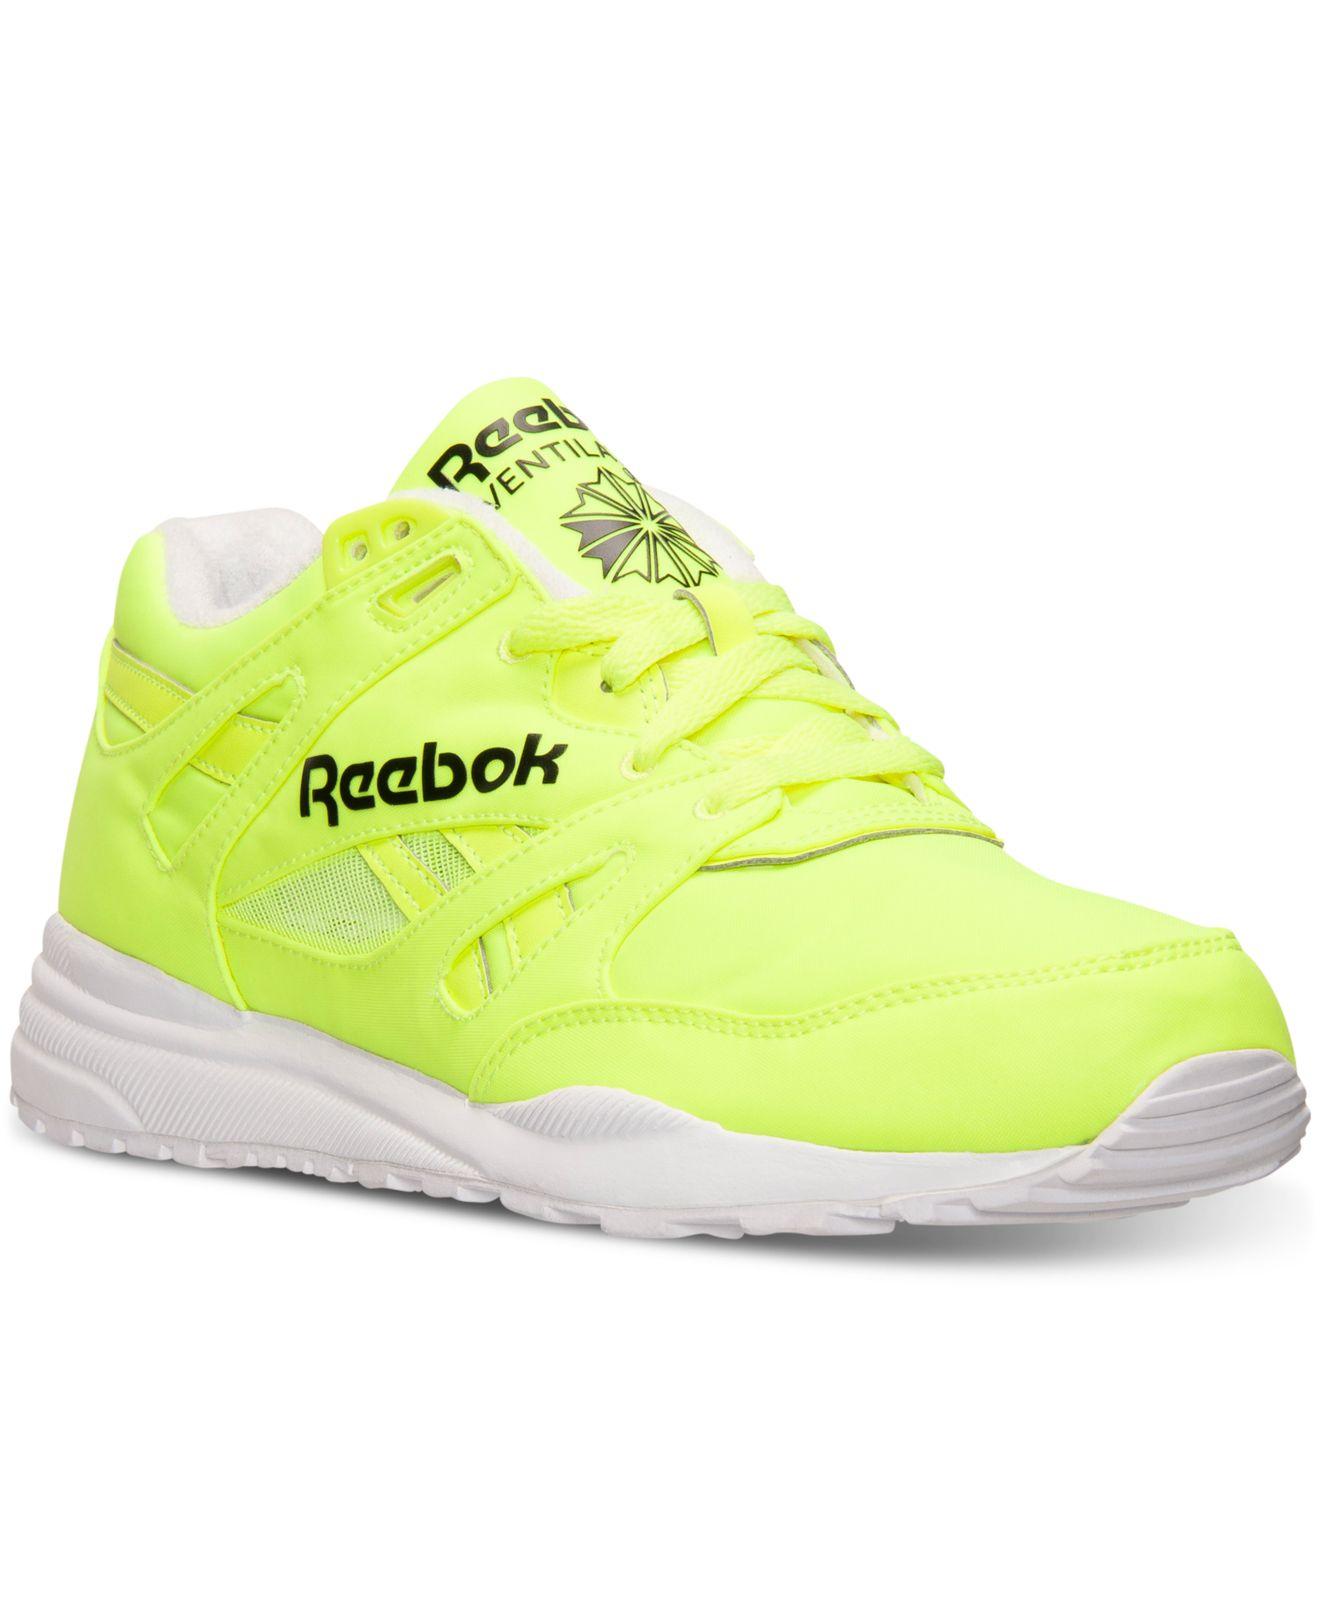 38166793f81d Lyst - Reebok Men s Ventilator Day Glow Casual Sneakers From Finish ...